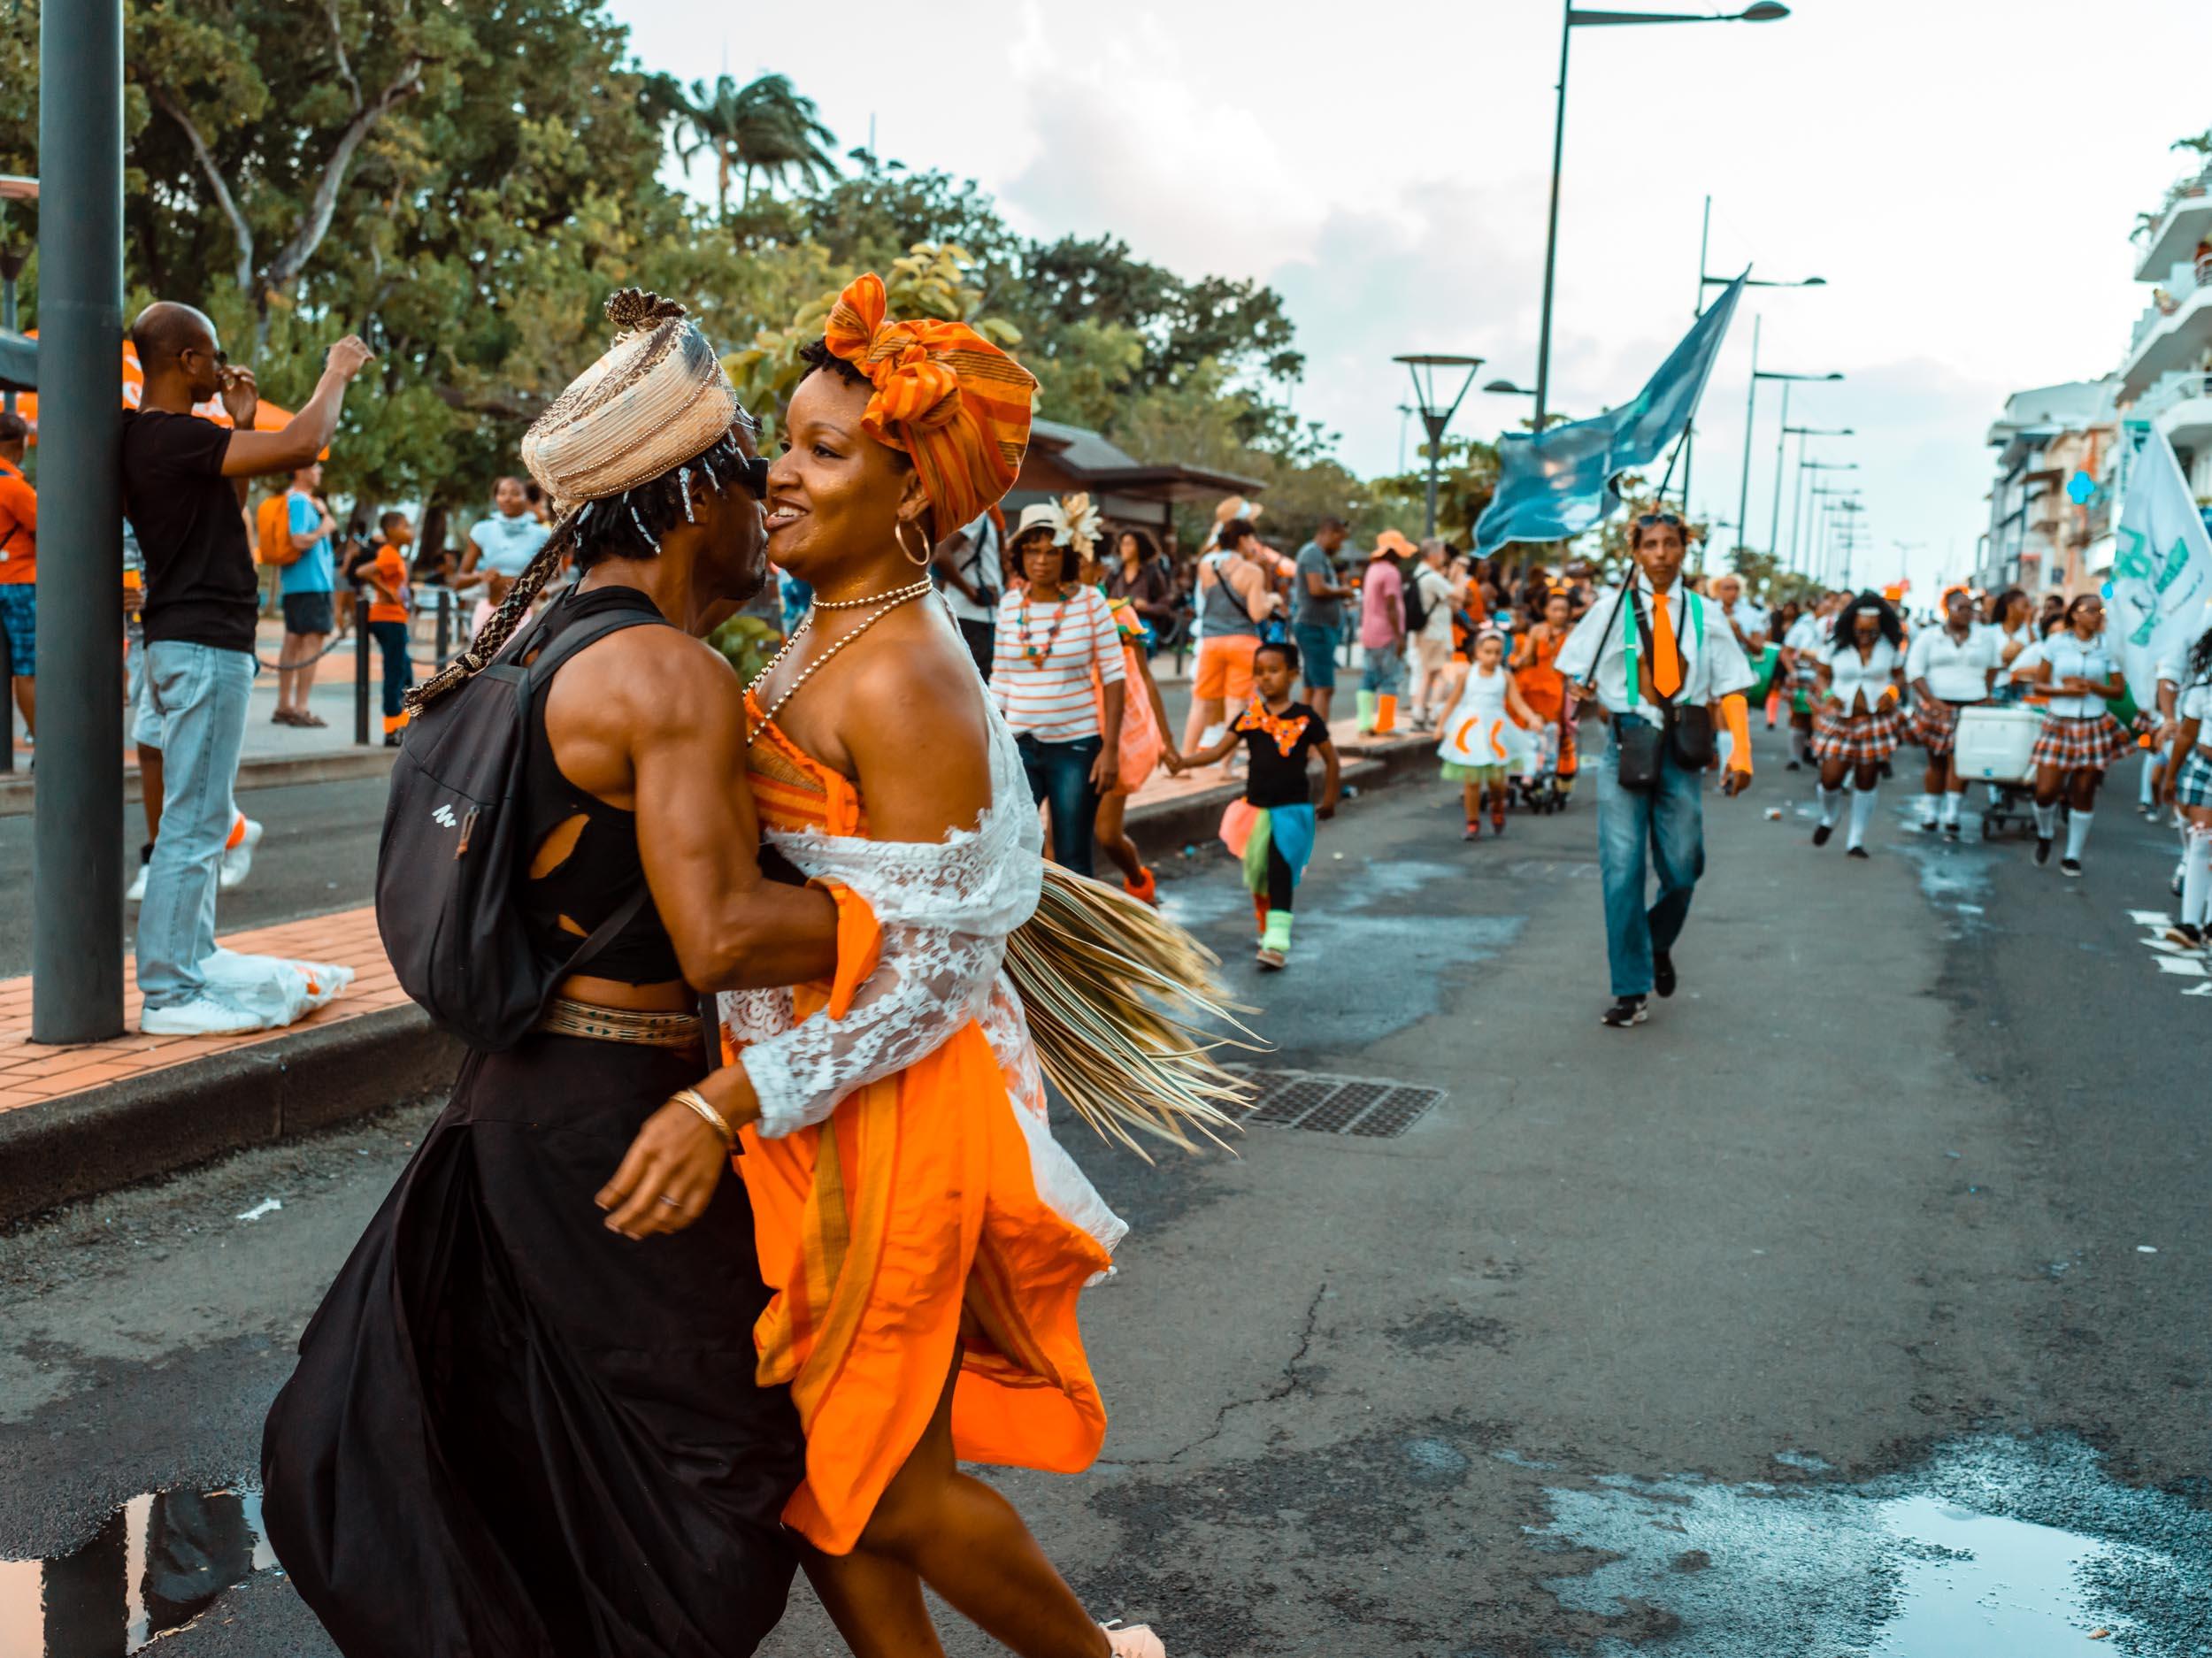 180212_SK_Martinique-23.jpg